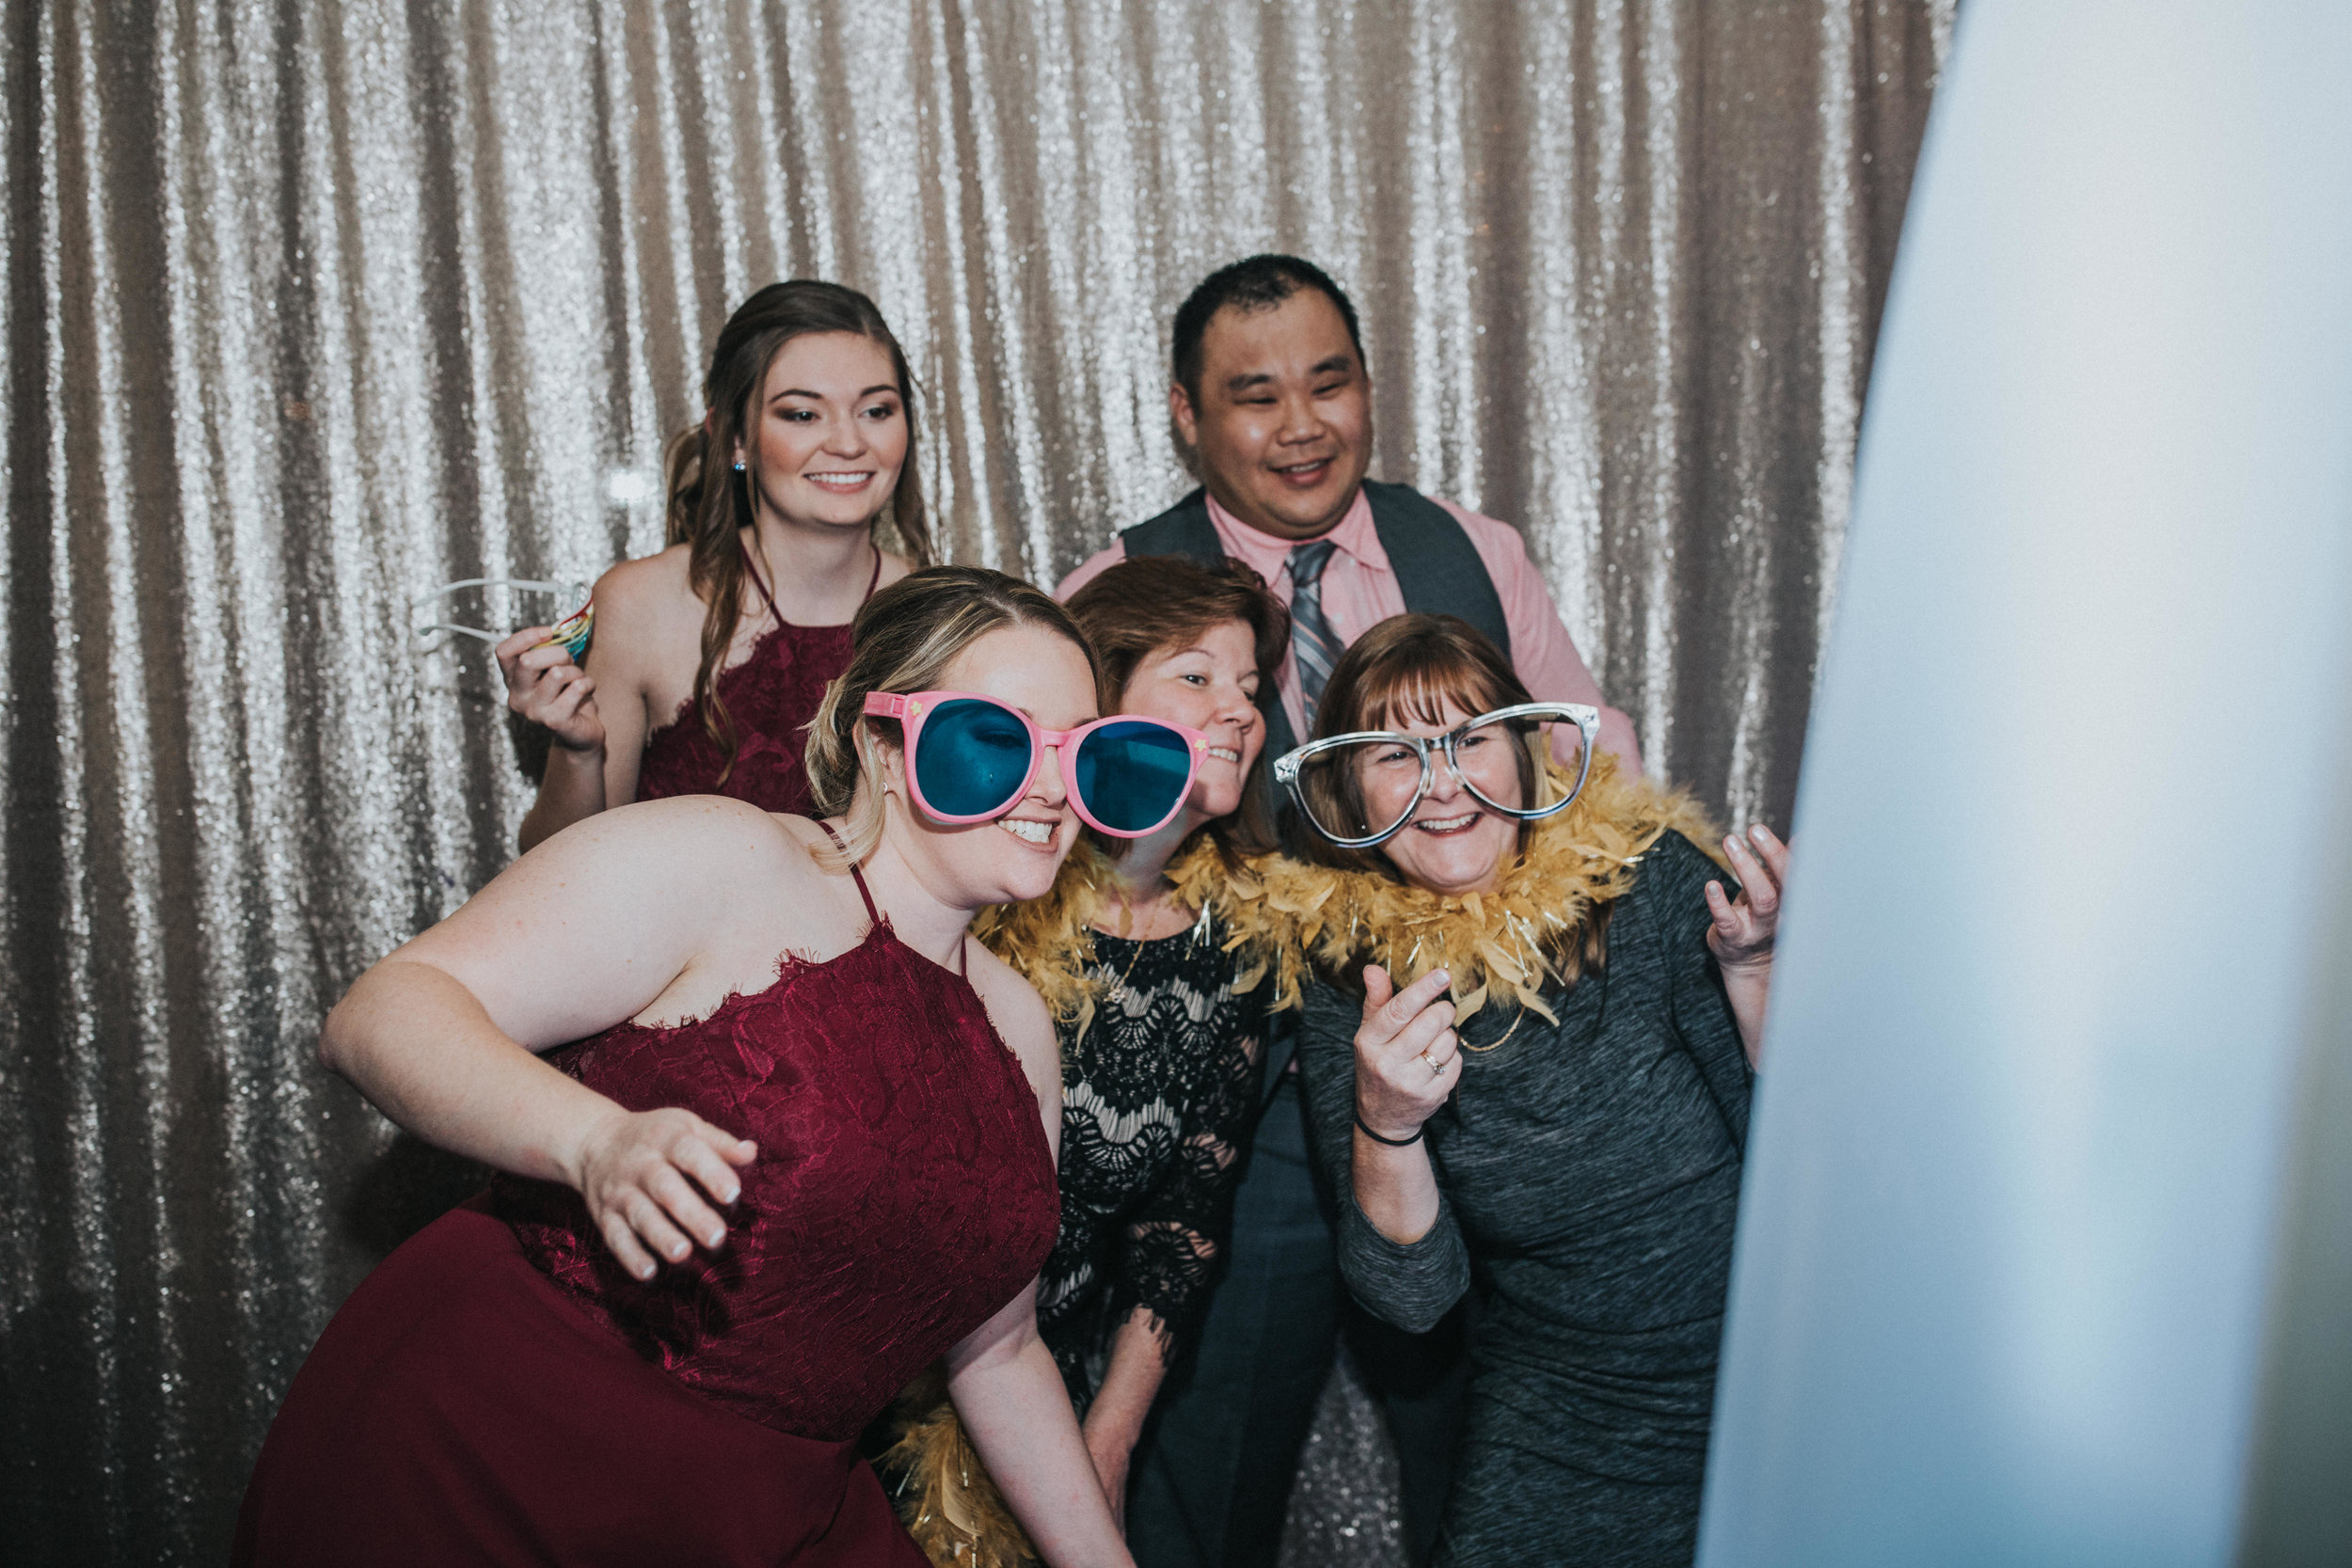 New-Jersey-Wedding-Photography-Fishers-Tudor-House-JennaLynnPhotography-Reception-Kathleen&Eddie-156.jpg